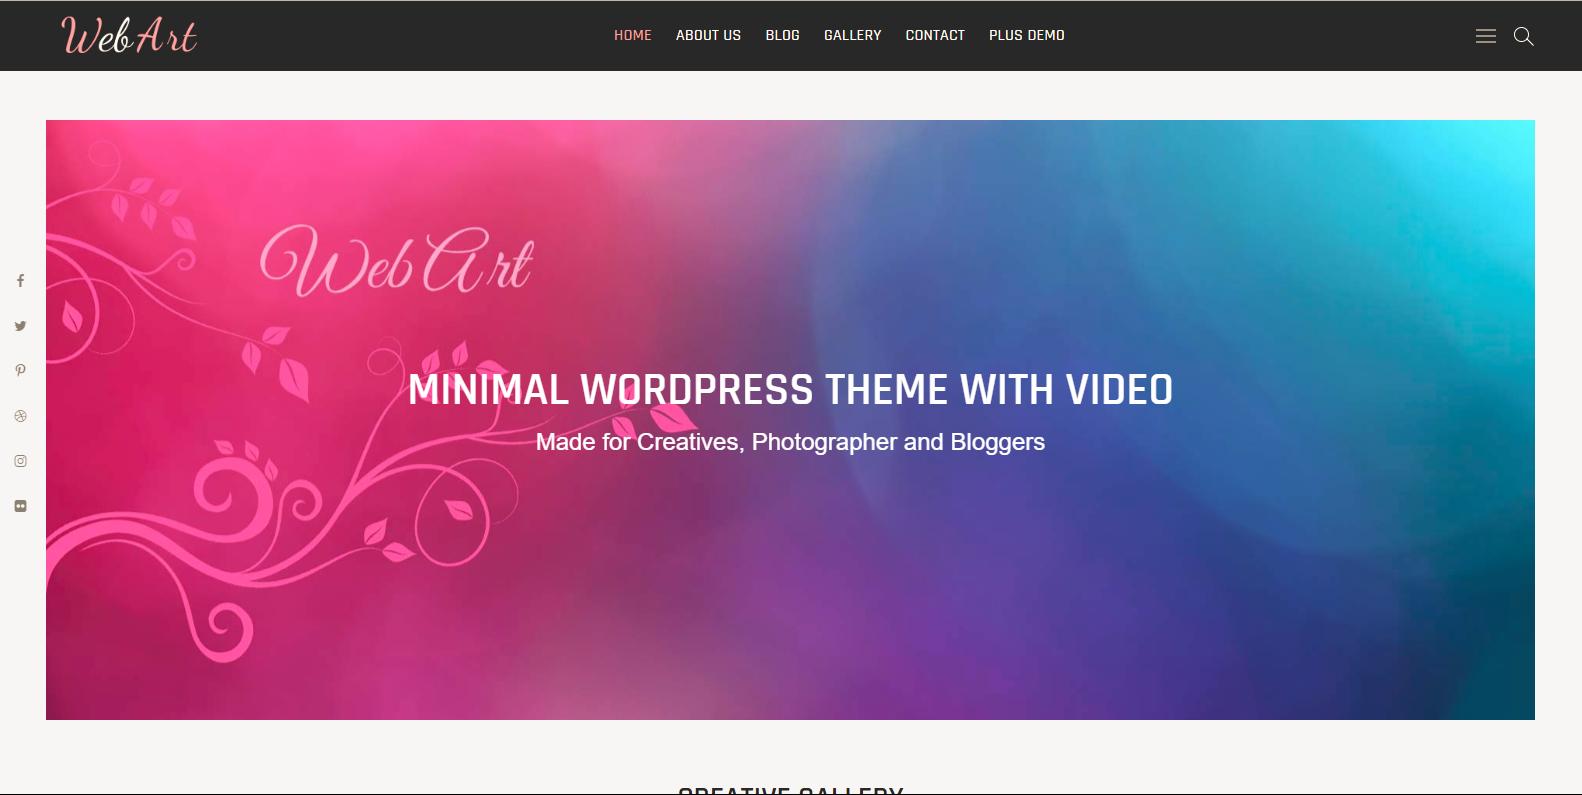 WordPress图片主题:Webart